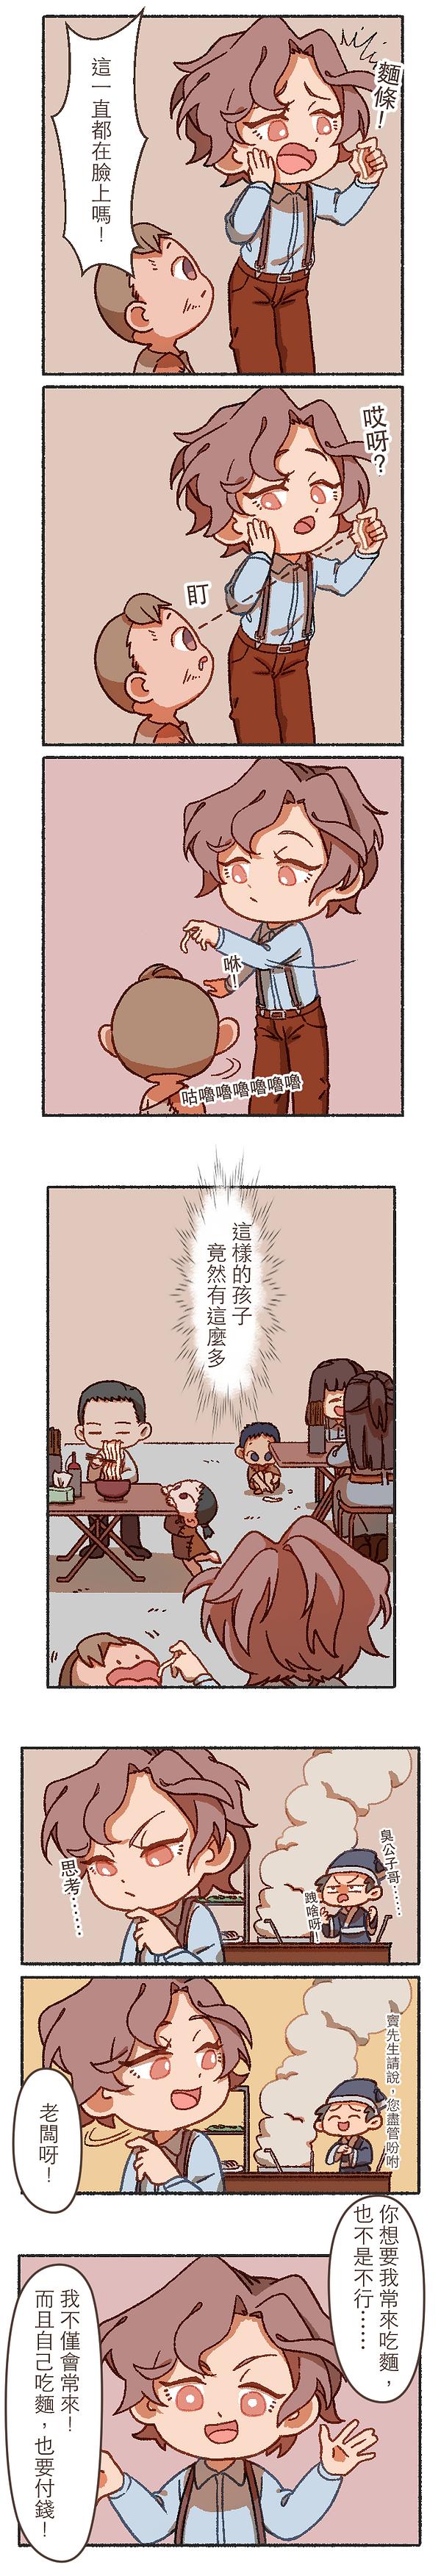 竇蓮魁01-3.png